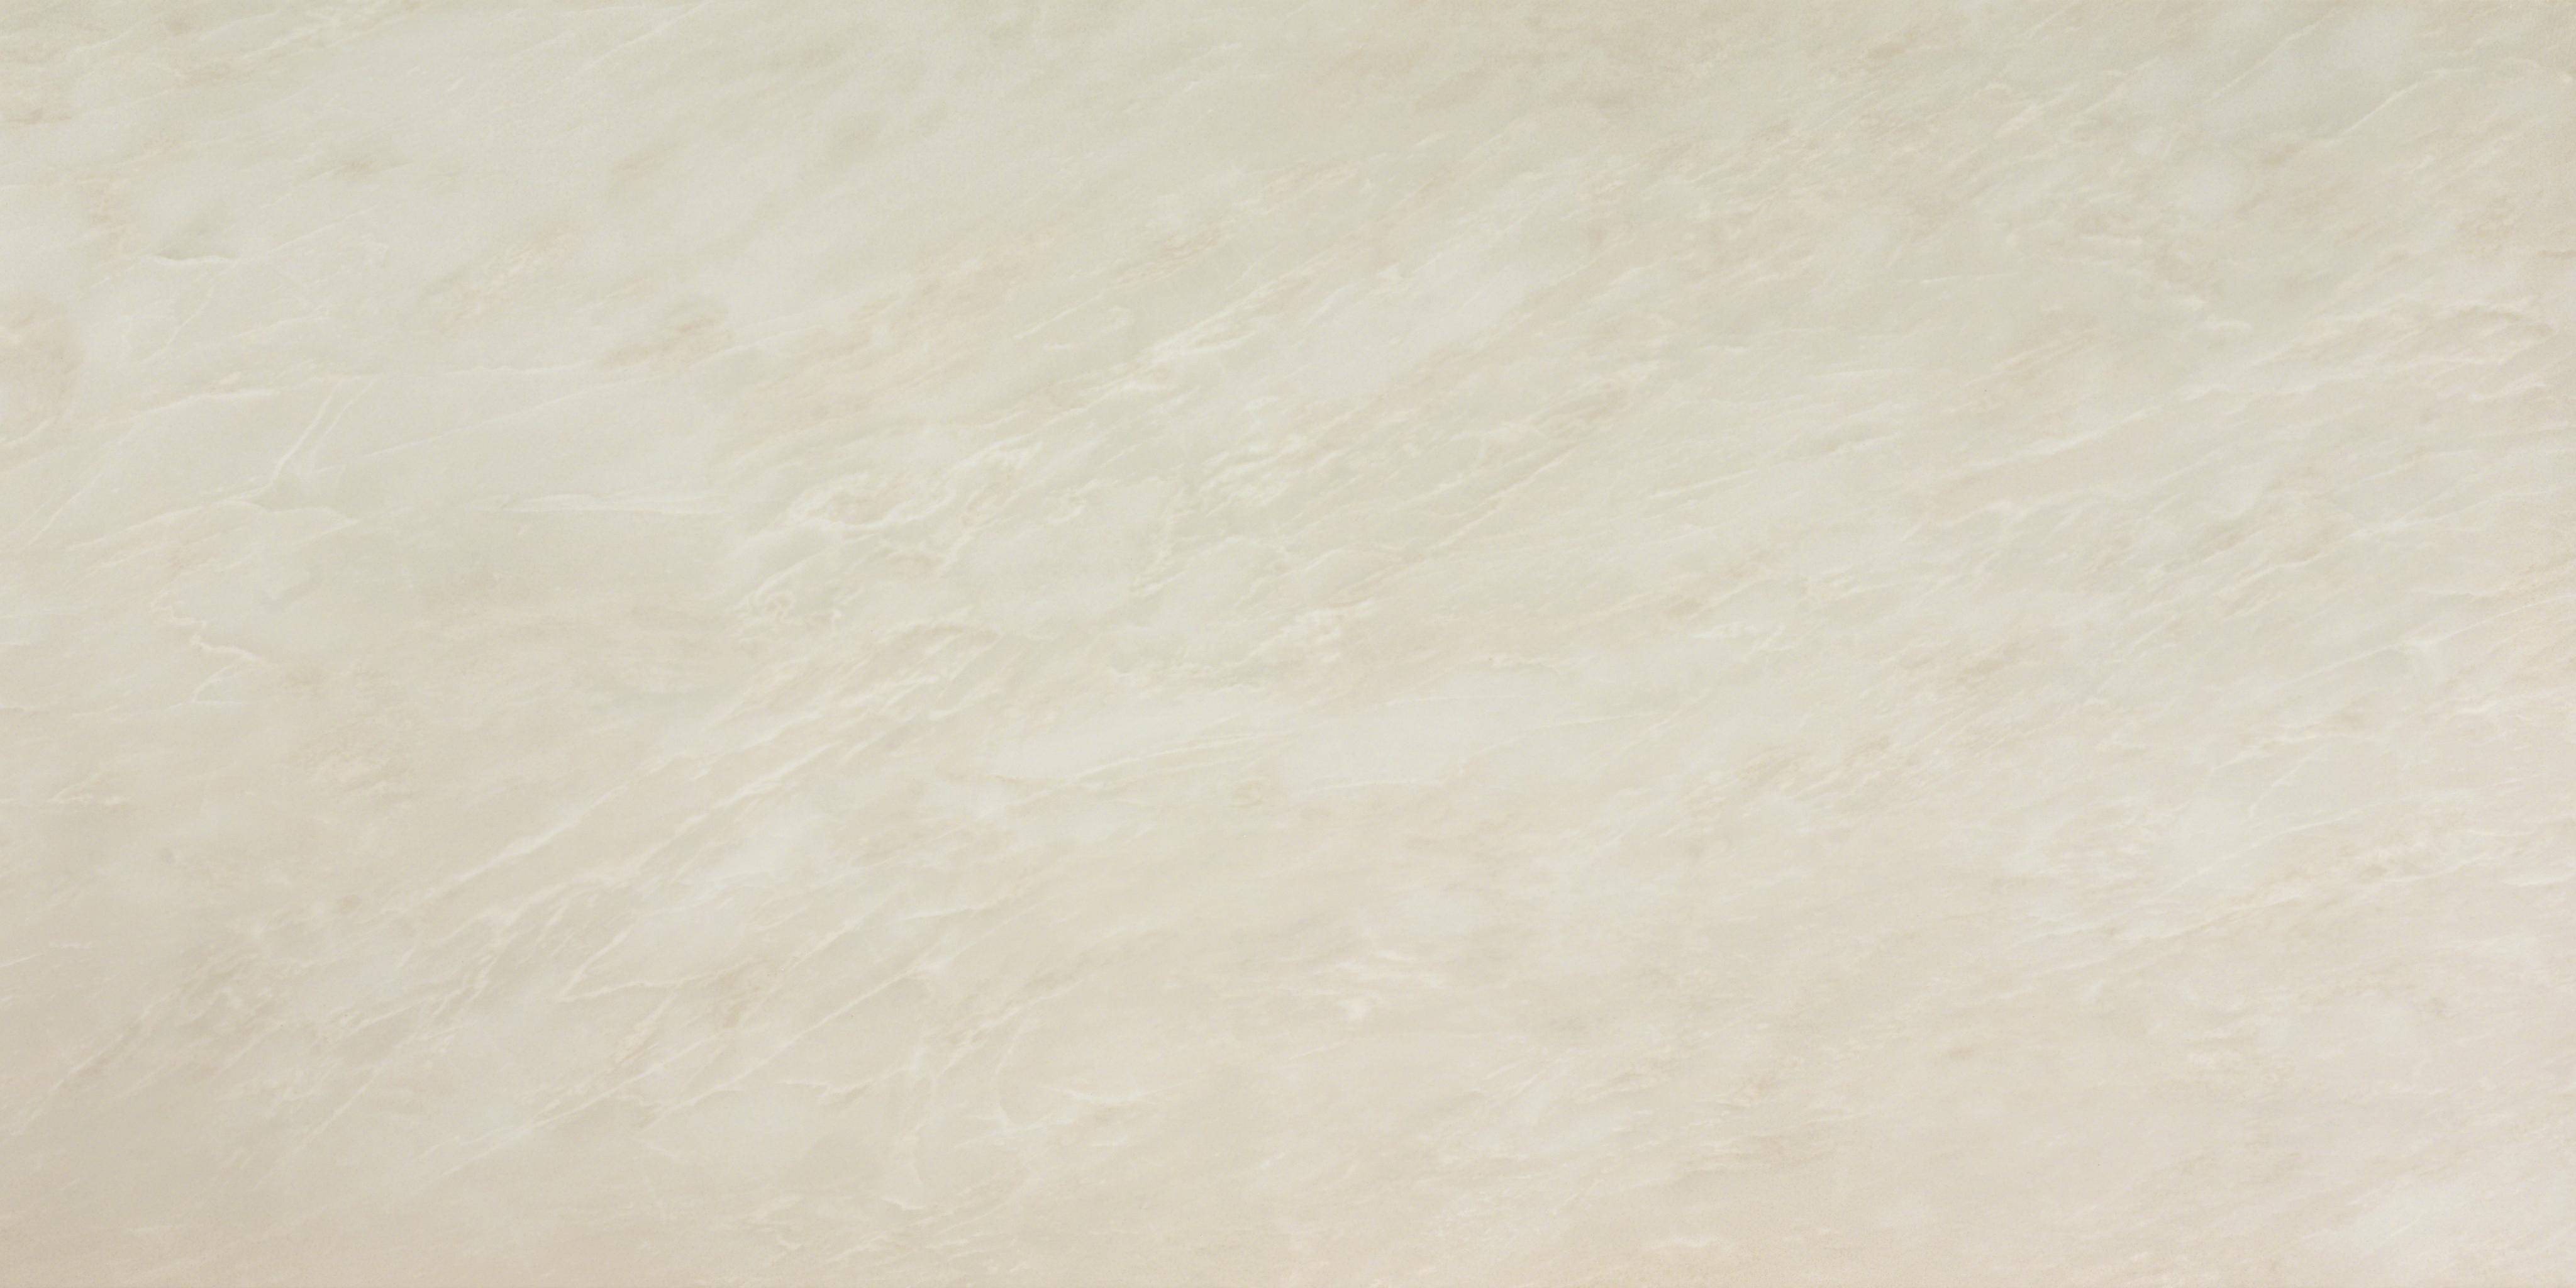 Marvel Edge MARVEL Imperial White 75x150 Lappato: Porcelain Tiles - Atlas  Concorde